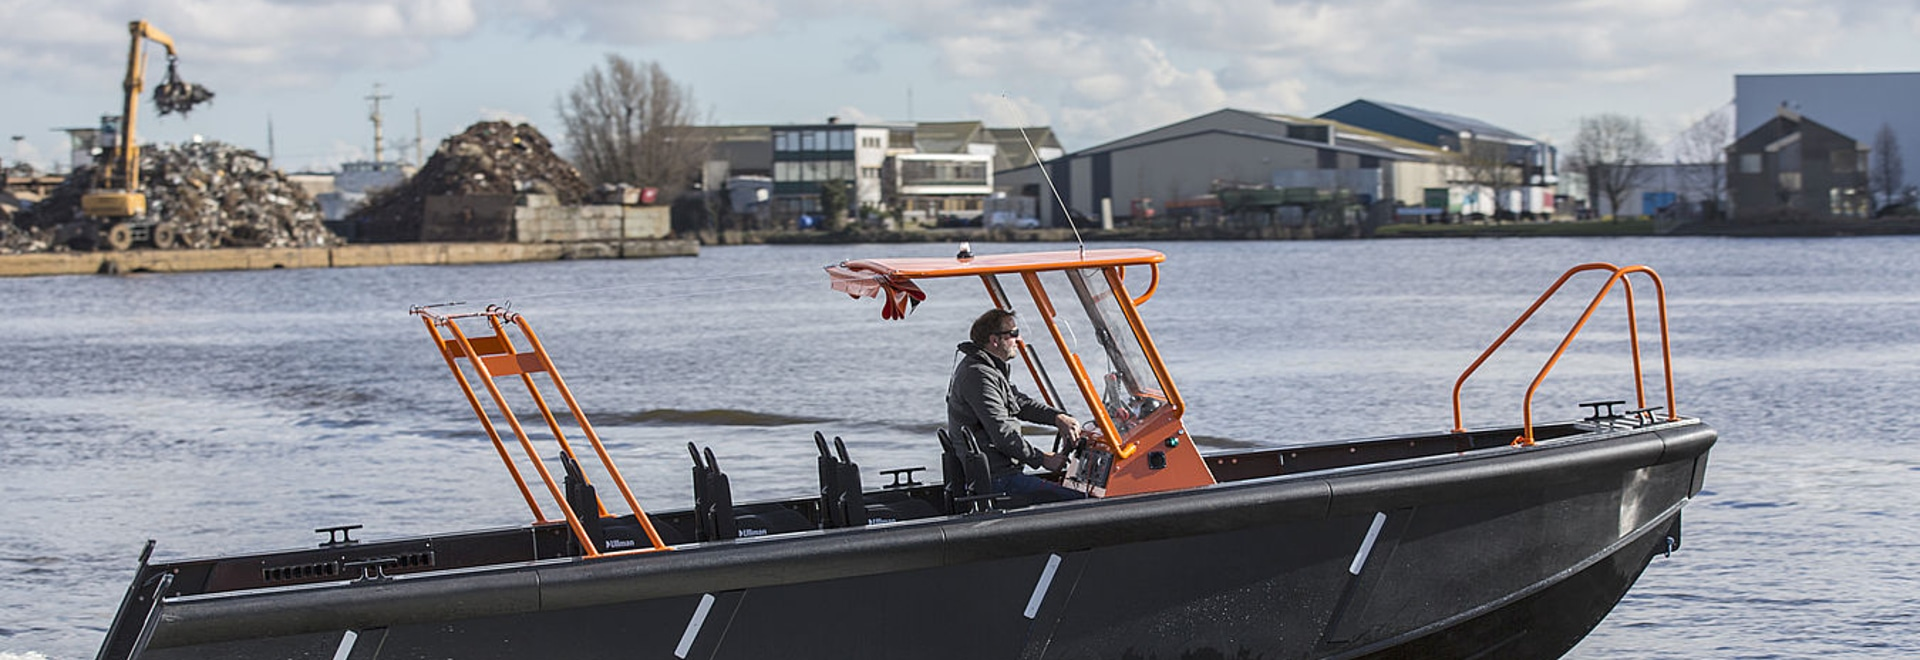 New Dutch high speed Crew Tender 'with balls'.